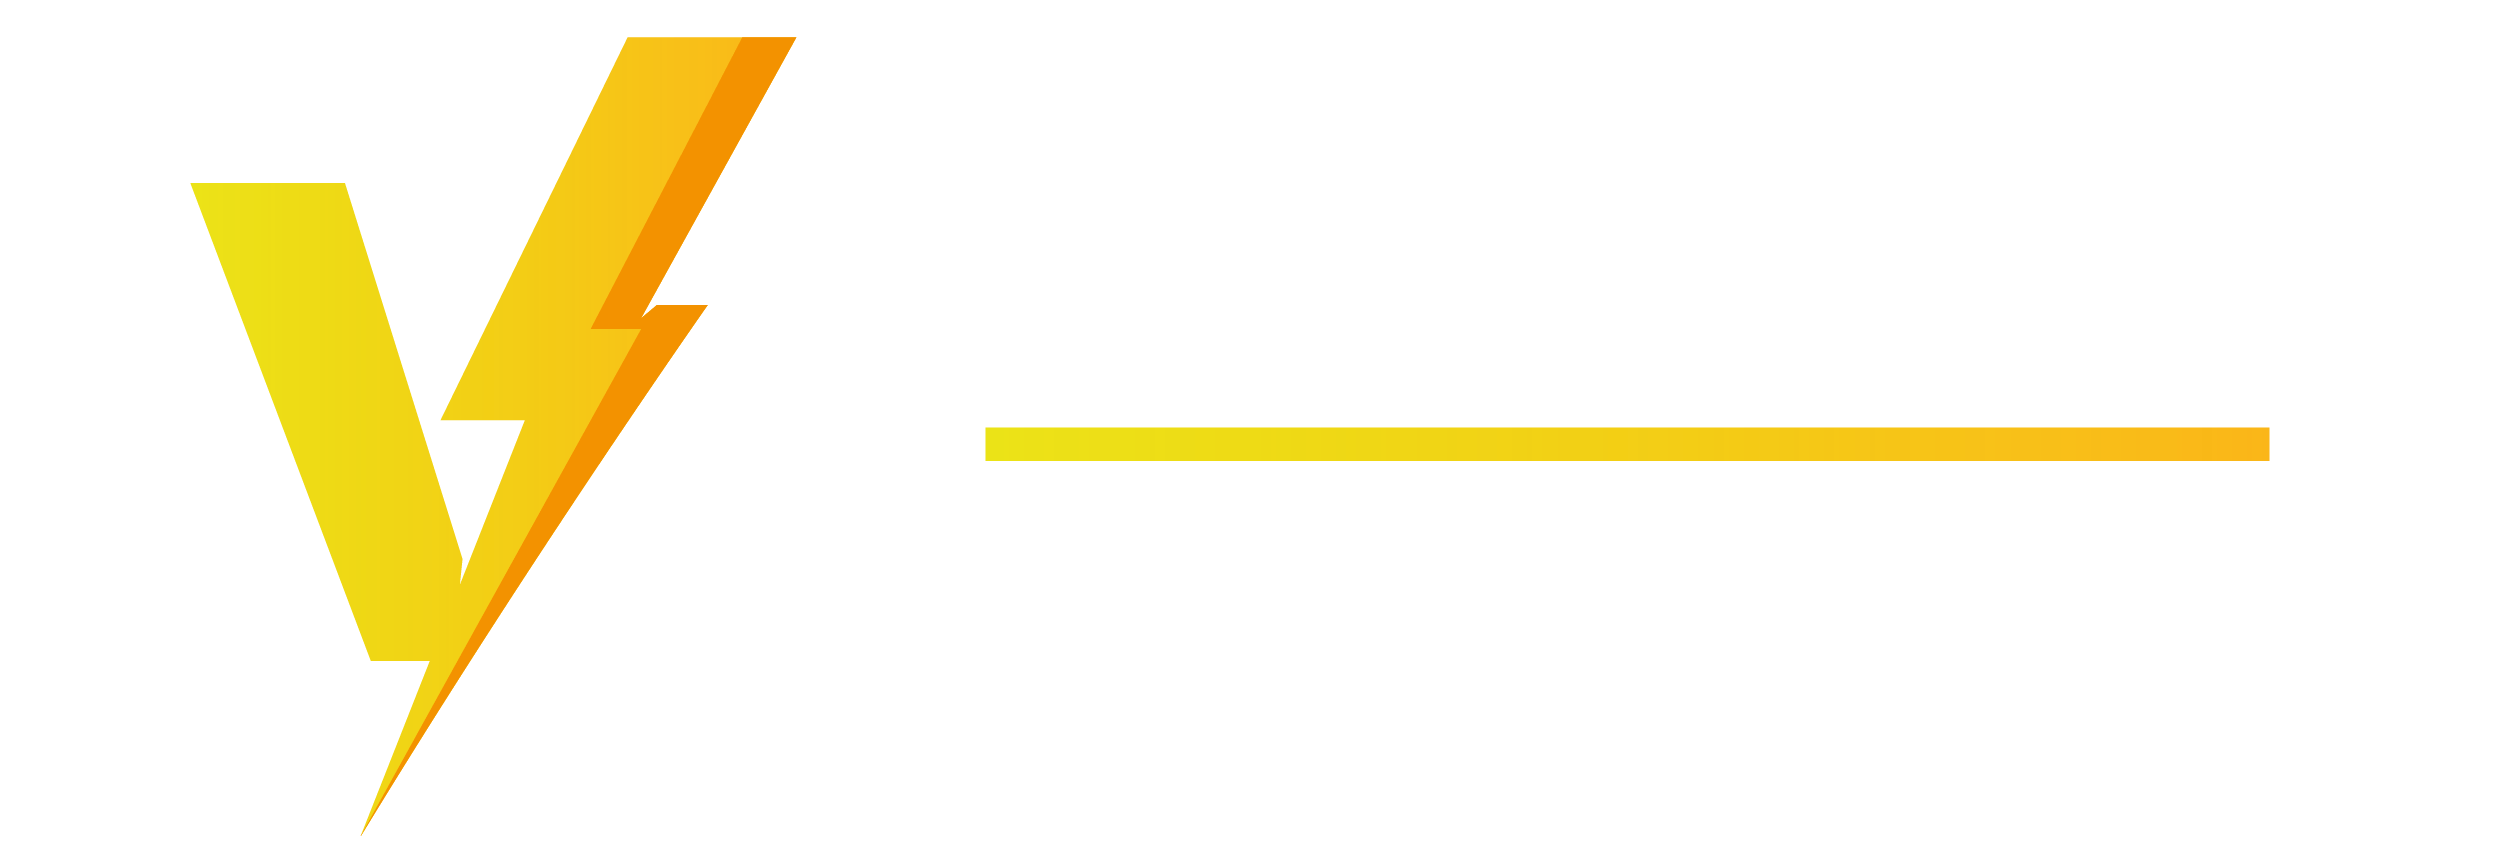 Wilmar Velasquez – Marketing y lenguaje corporal